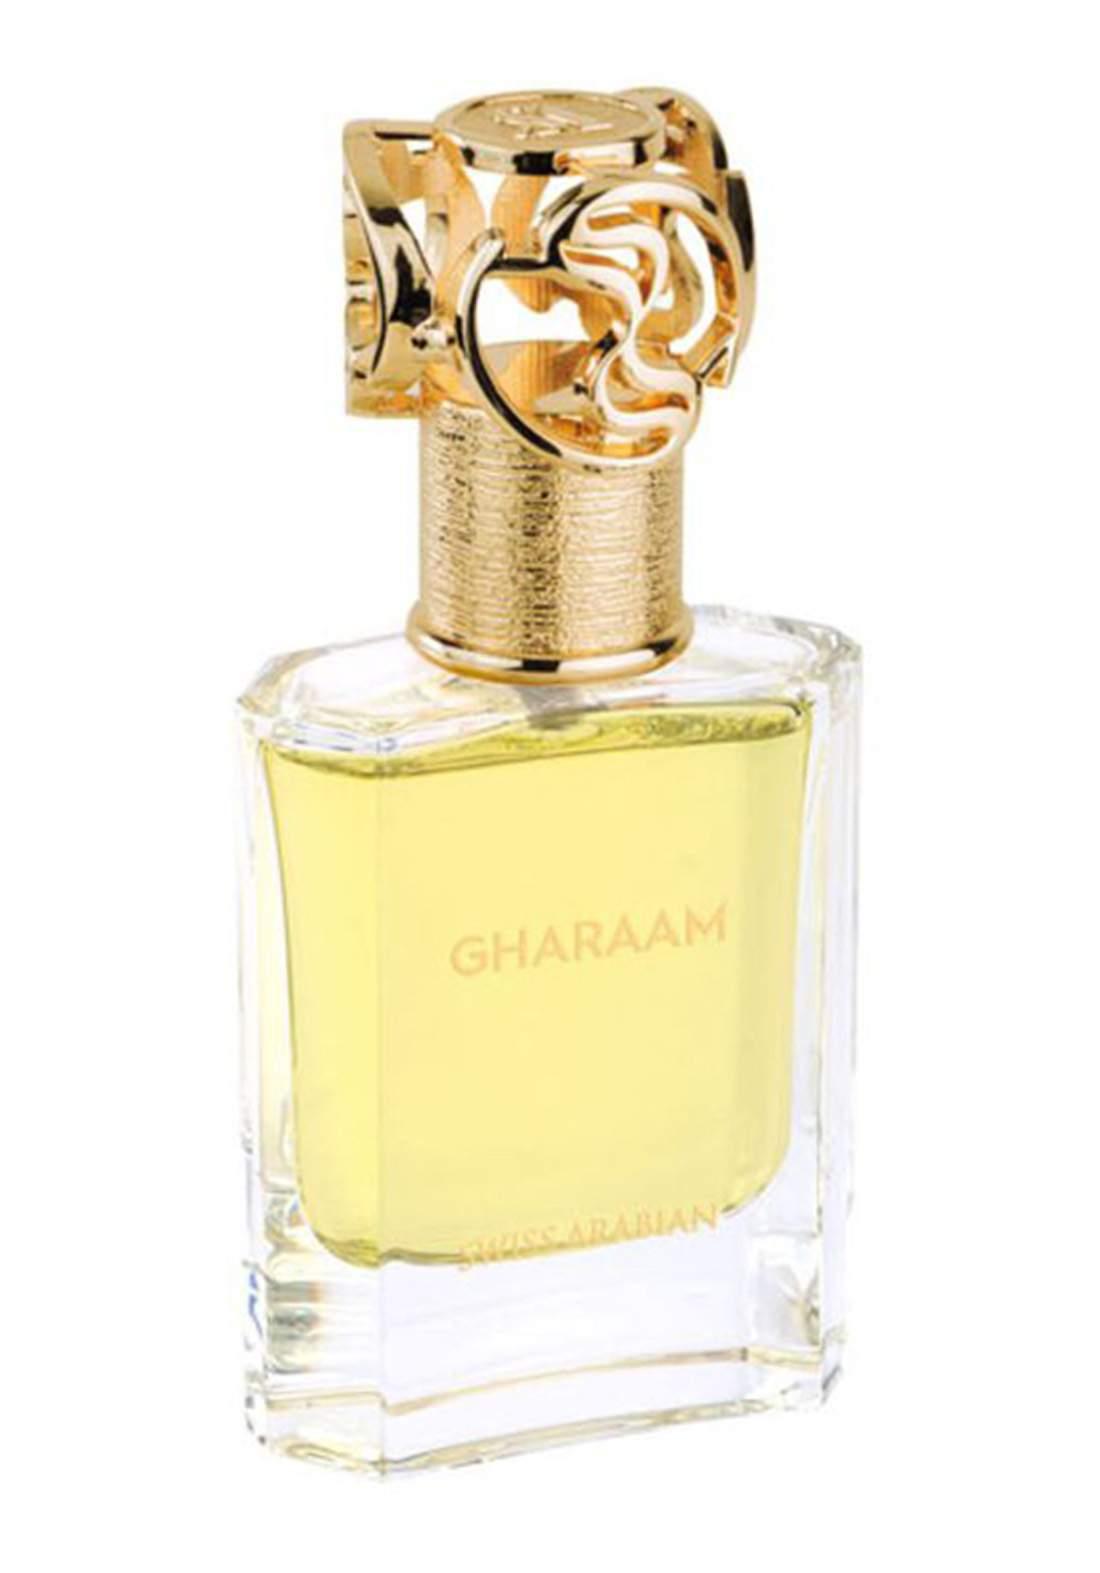 Swiss Arabian 1080 Gharaam Eau De Parfum Sprayfor  Men - 50ml عطررجالي